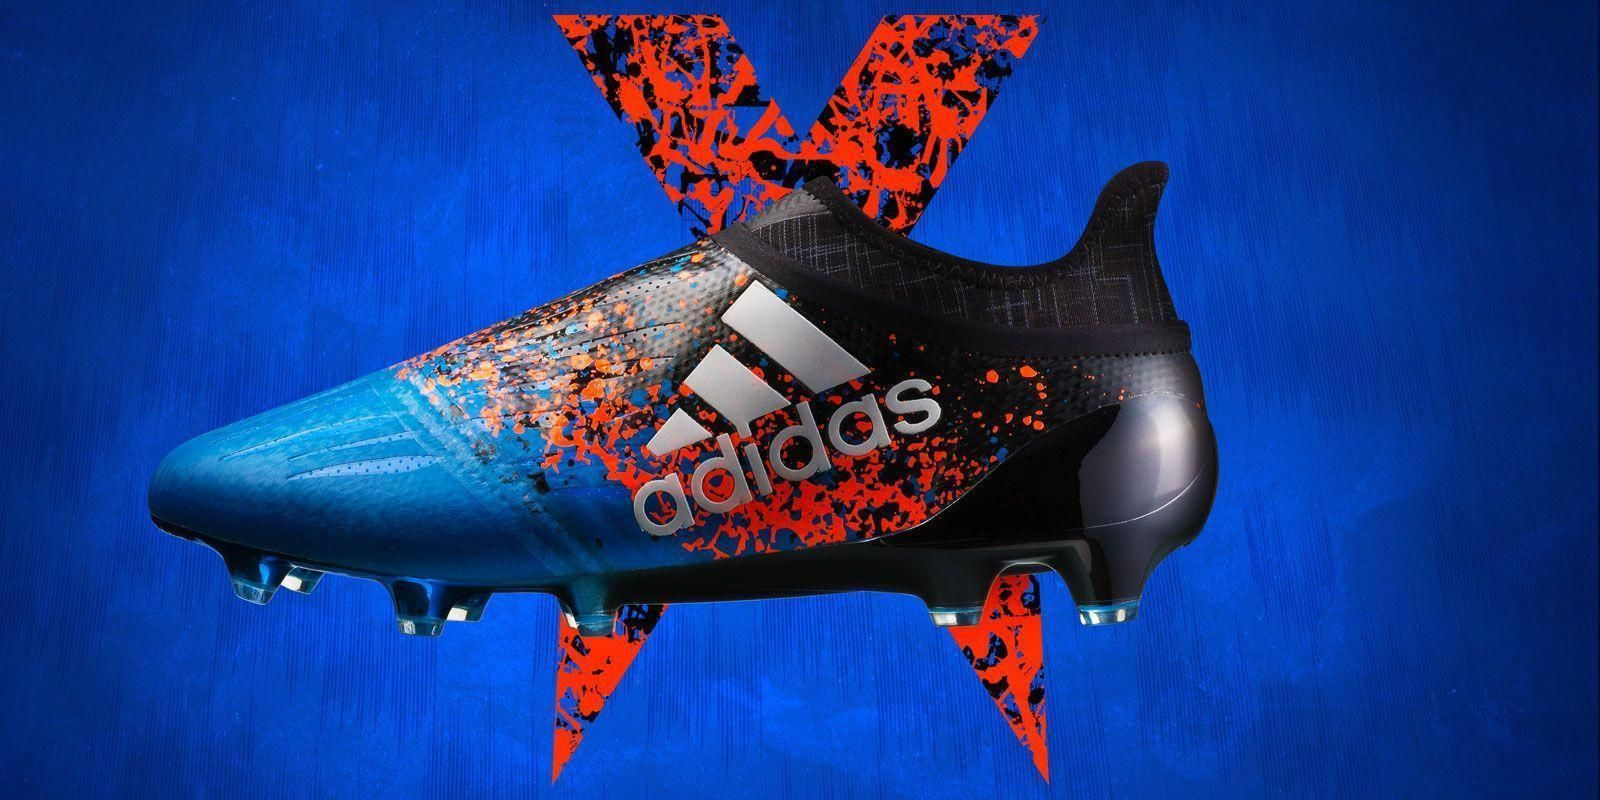 Adidas Boots Hd Wallpapers 5 Football Wallpapers Pinterest Adidas Boots Football Boots Boots